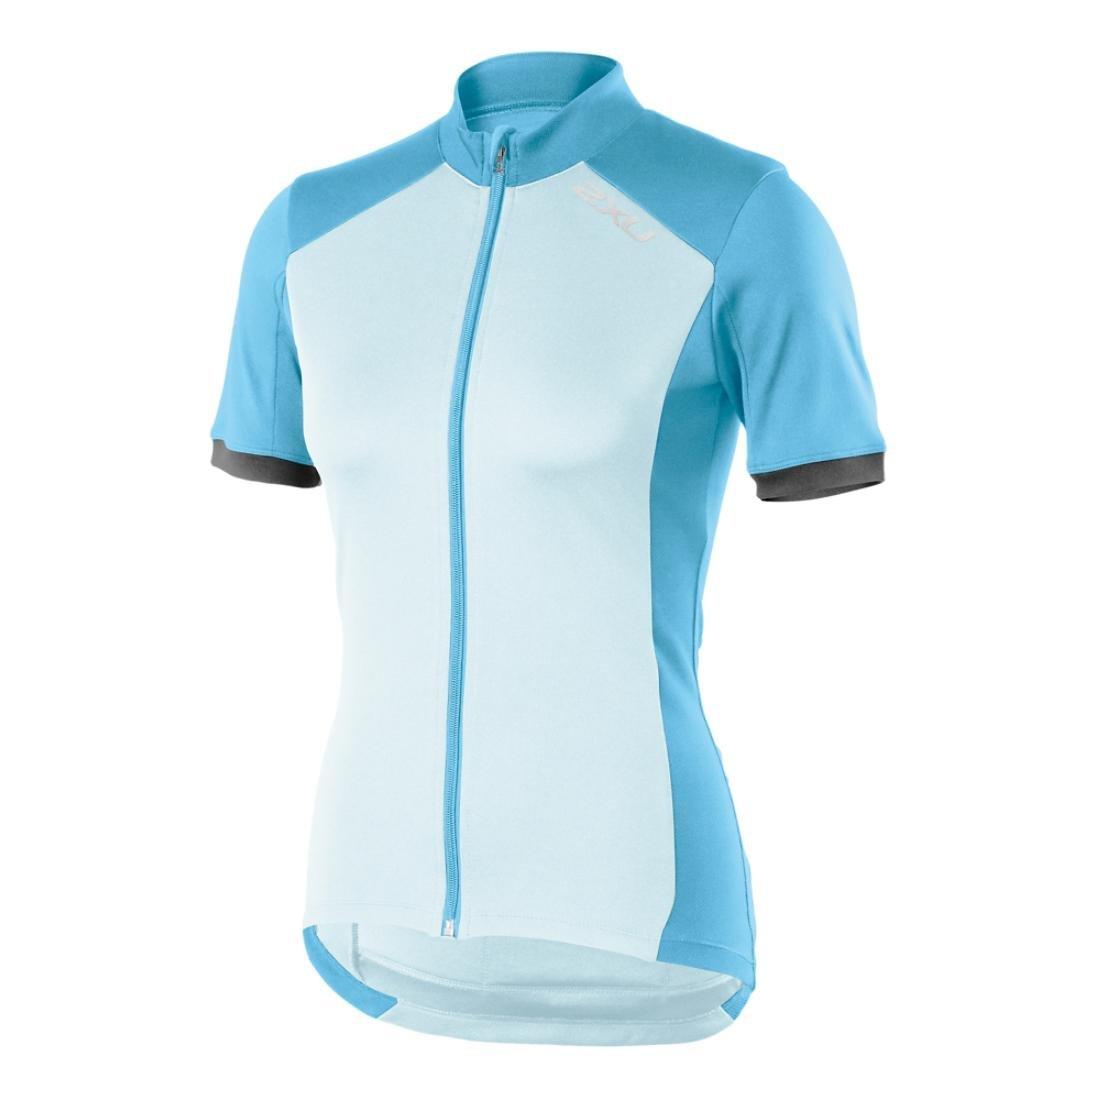 14f566010 Amazon.com   2XU Women s Active Cycle Jersey   Sports   Outdoors